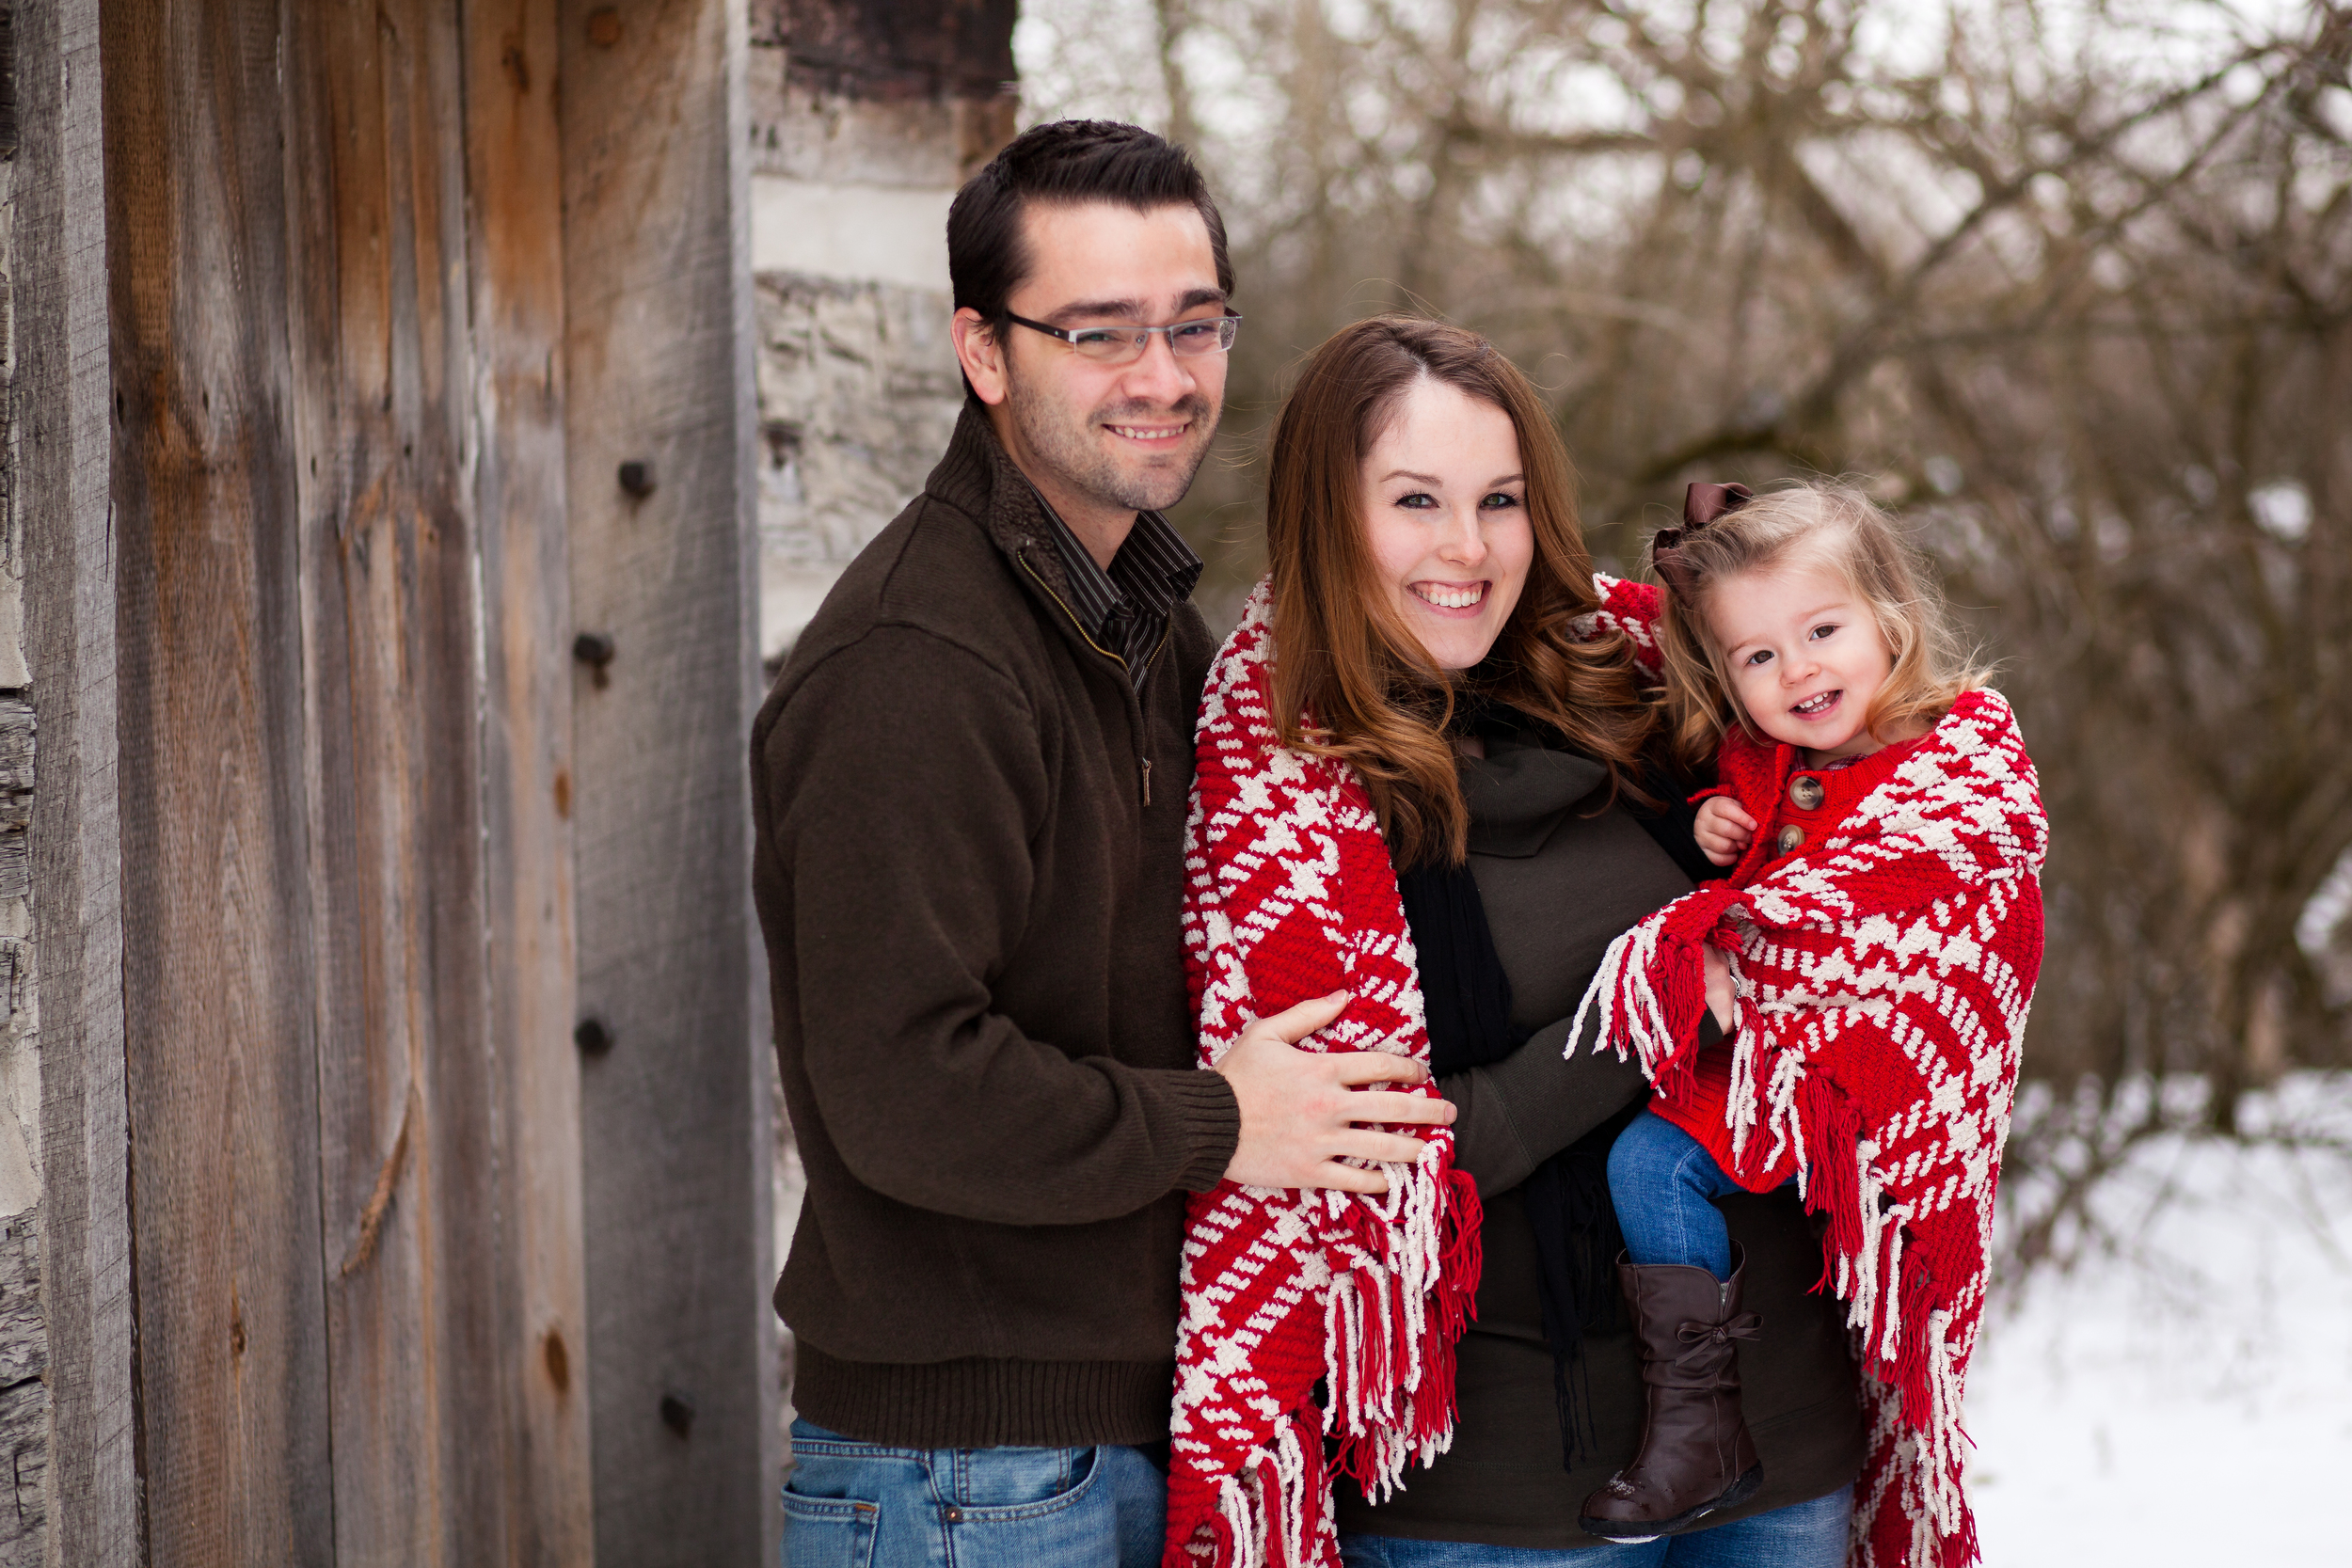 buckinghamfamily-7.jpg